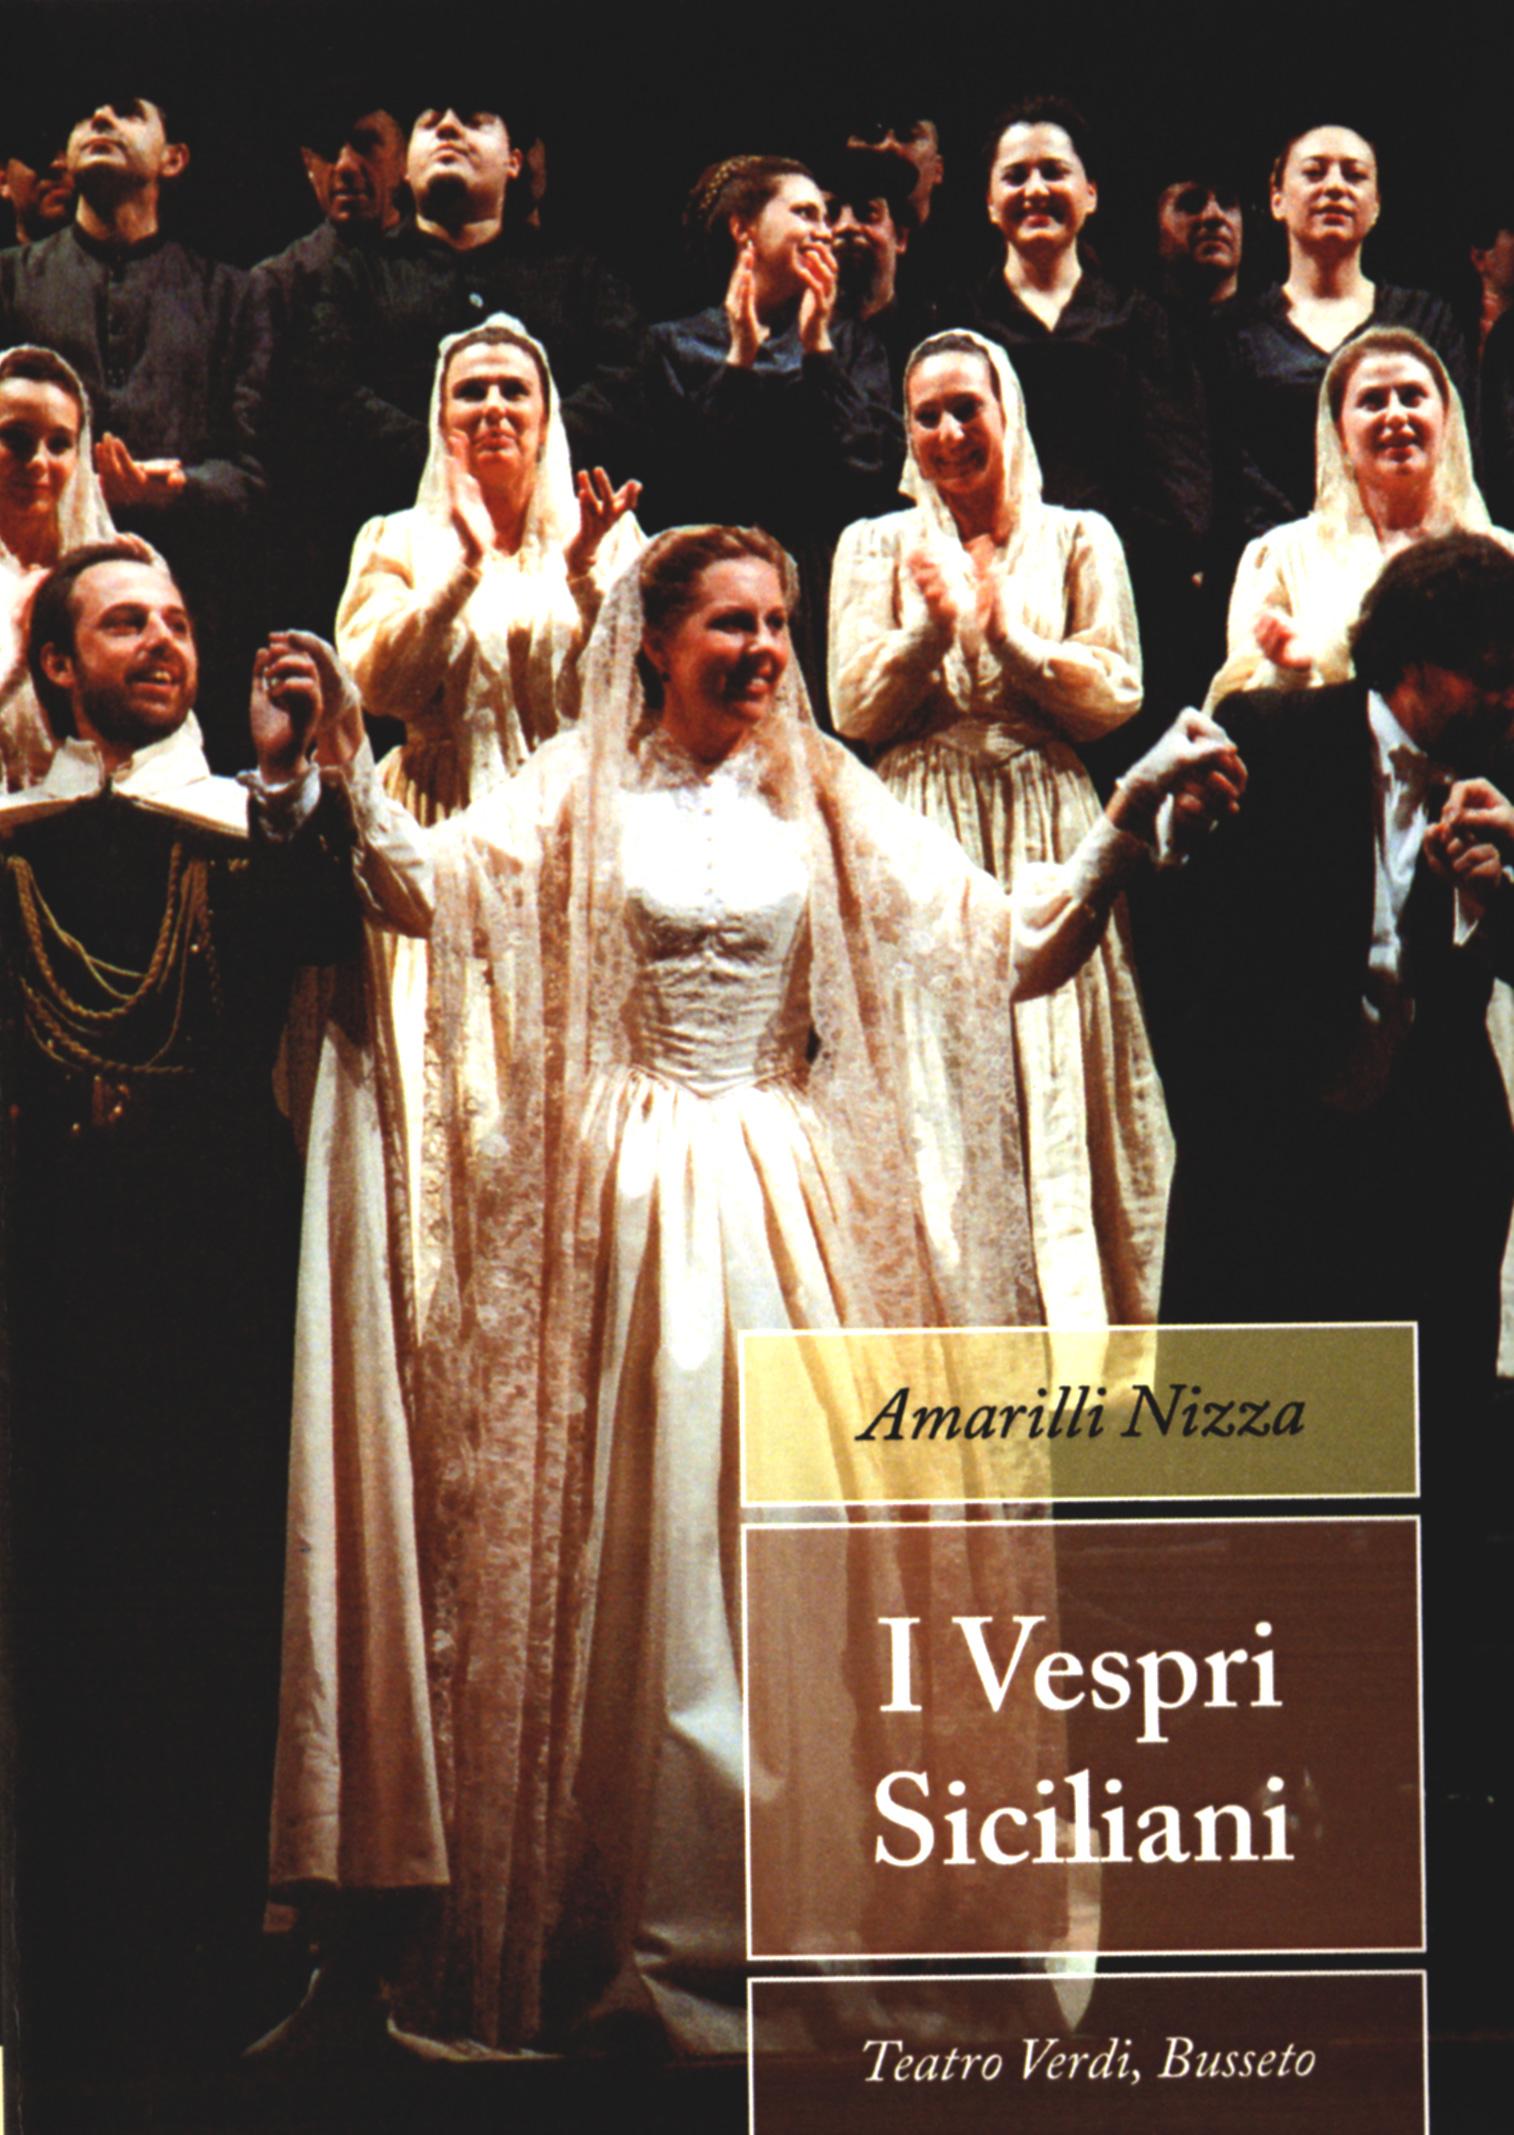 I vespri siciliani - Giuseppe Verdi